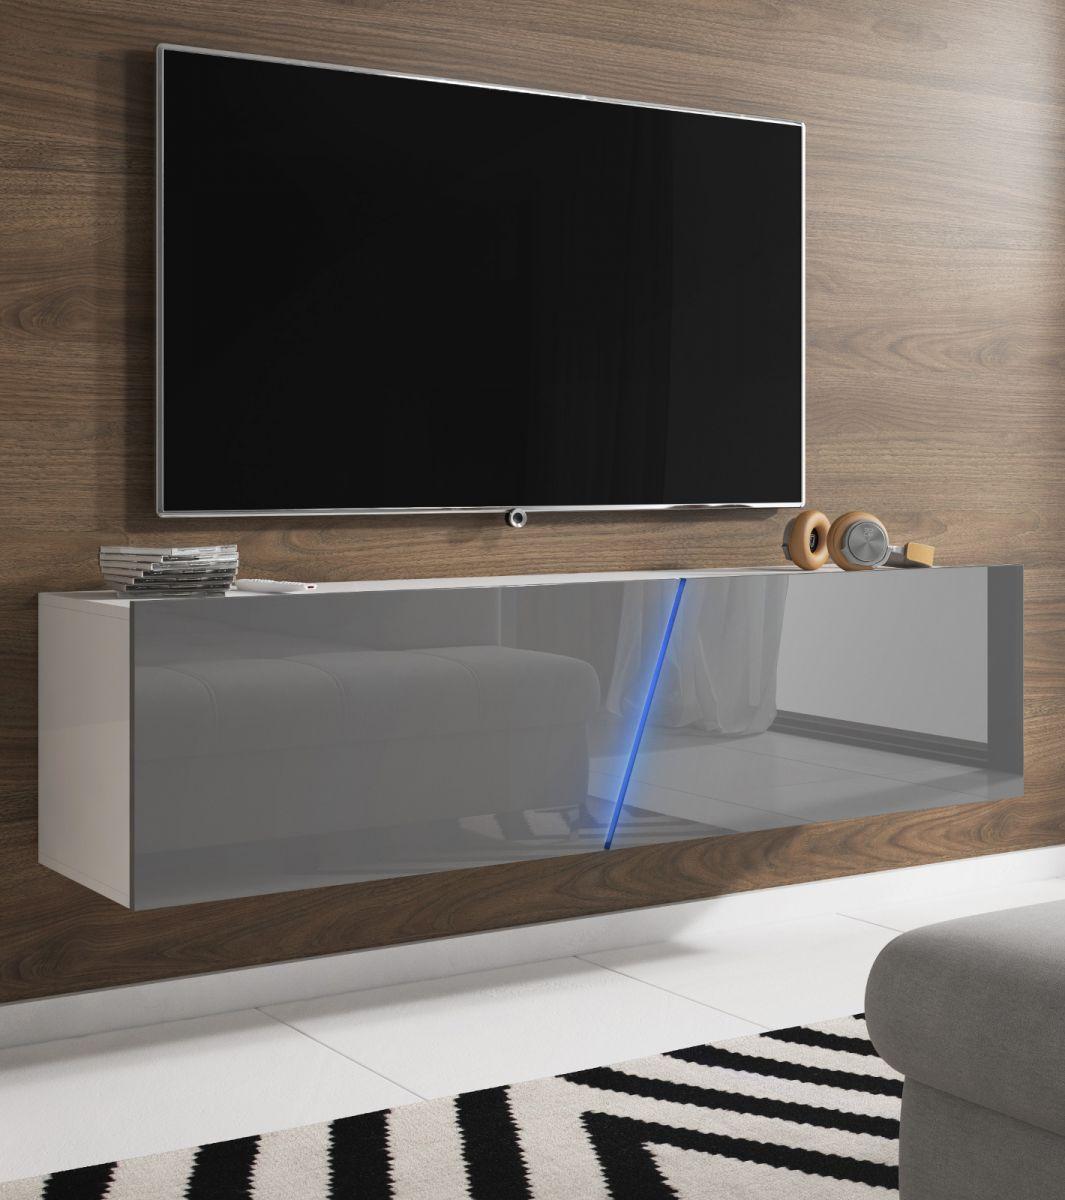 TV-Lowboard Space Lack Hochglanz grau mit Beleuchtung 160 cm